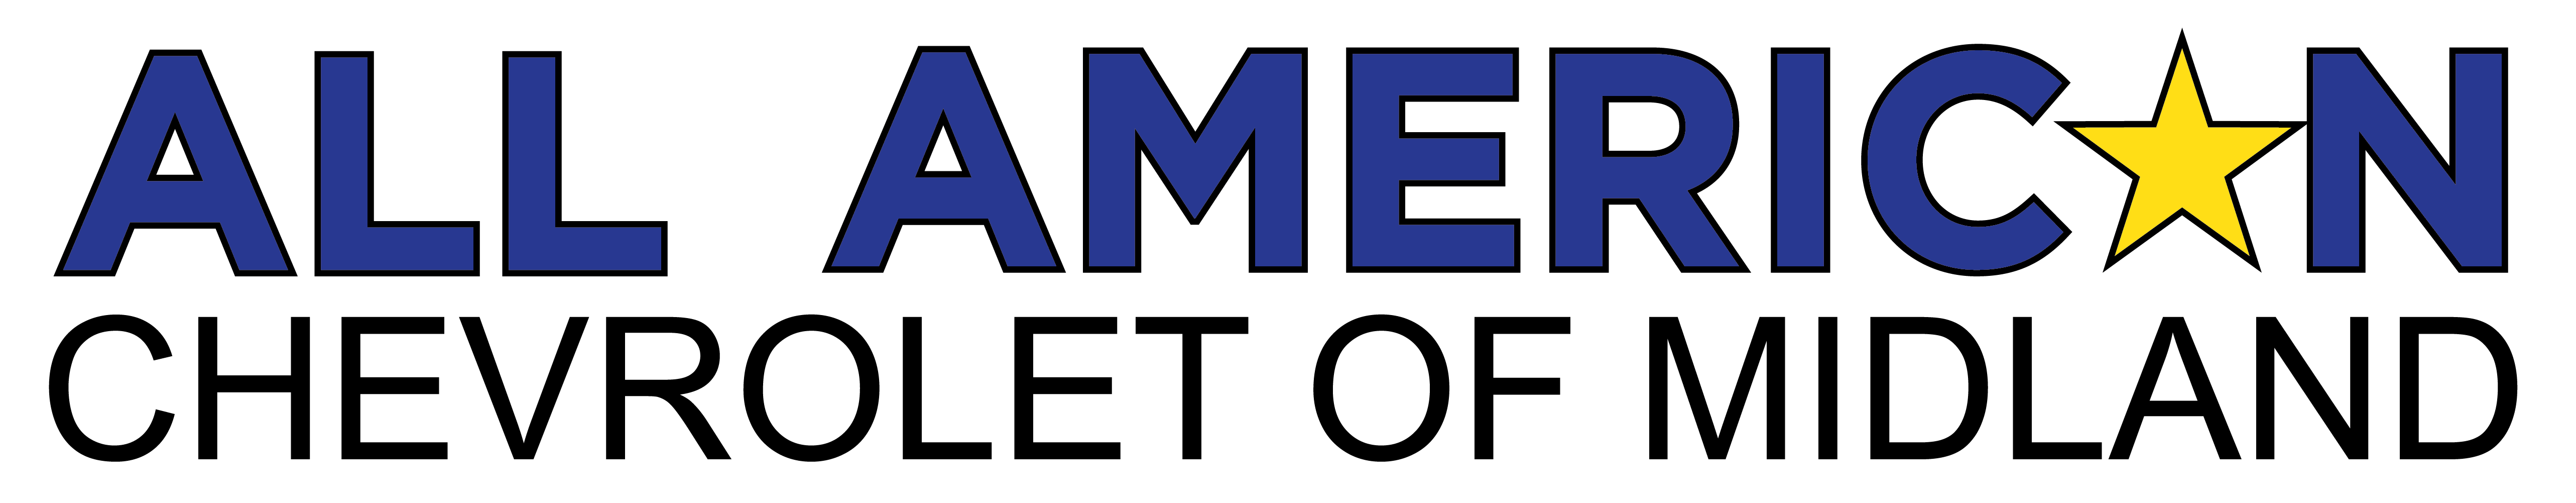 71756709_allamericanchevymidland_logo-01